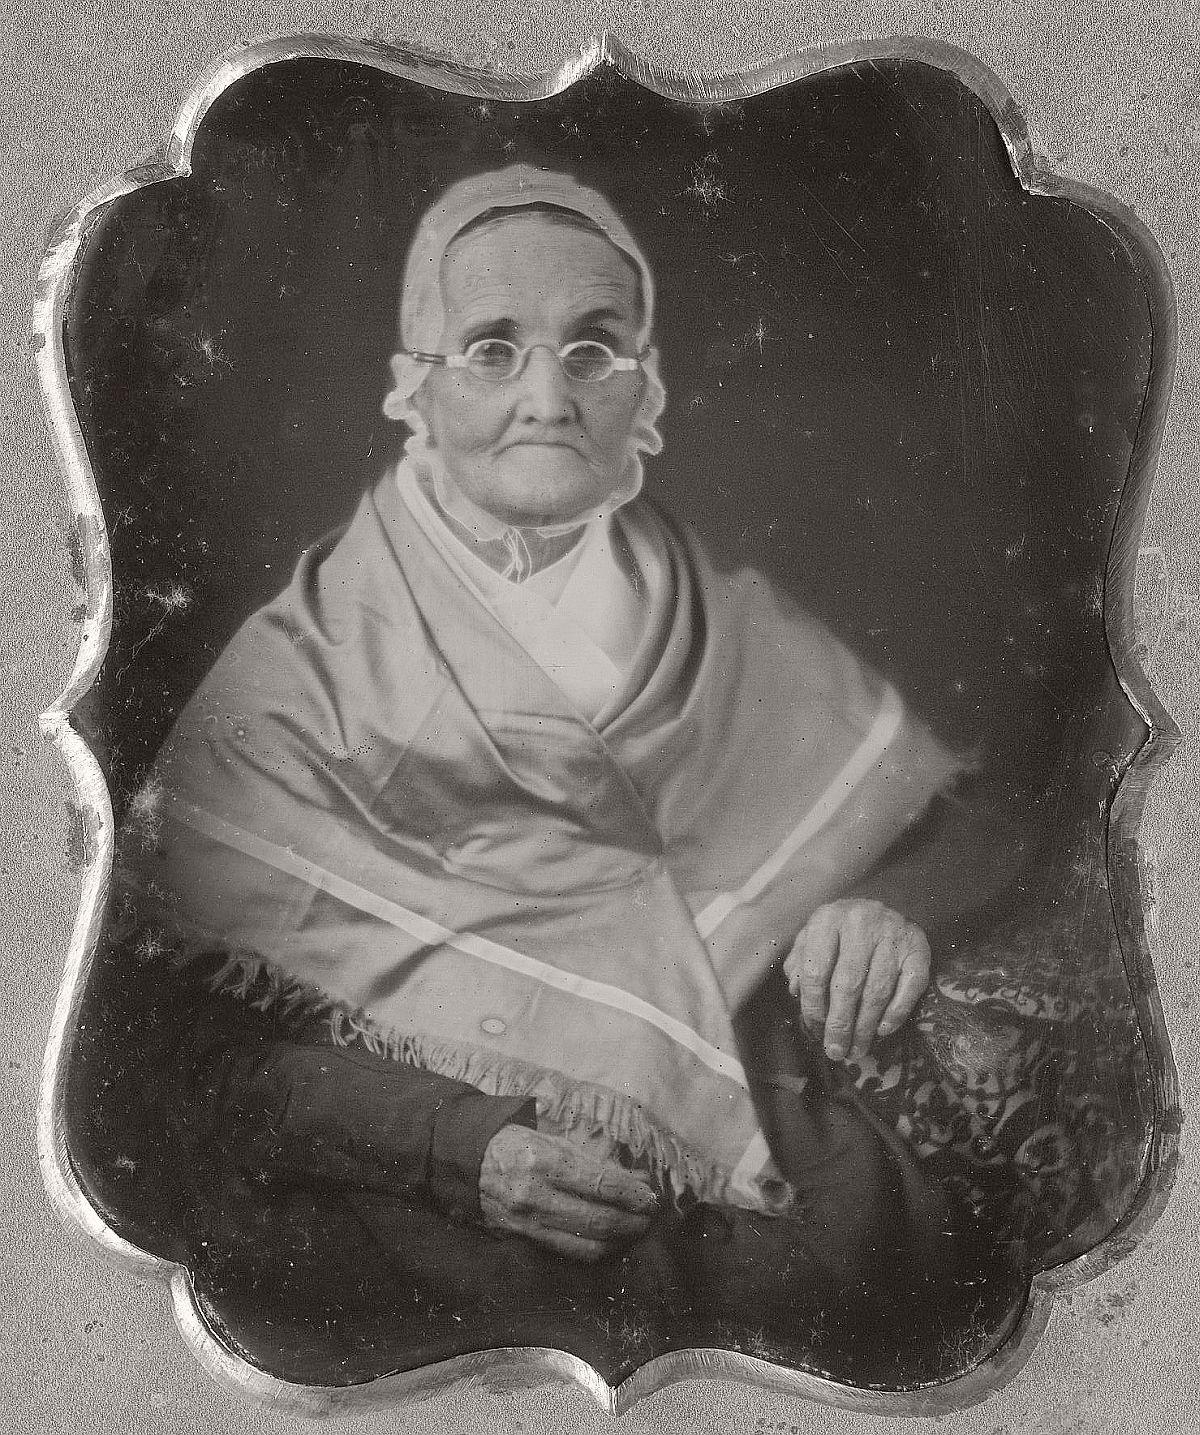 daguerreotype-portrait-people-born-in-the-late-18th-xviii-century-1700s-vintage-31